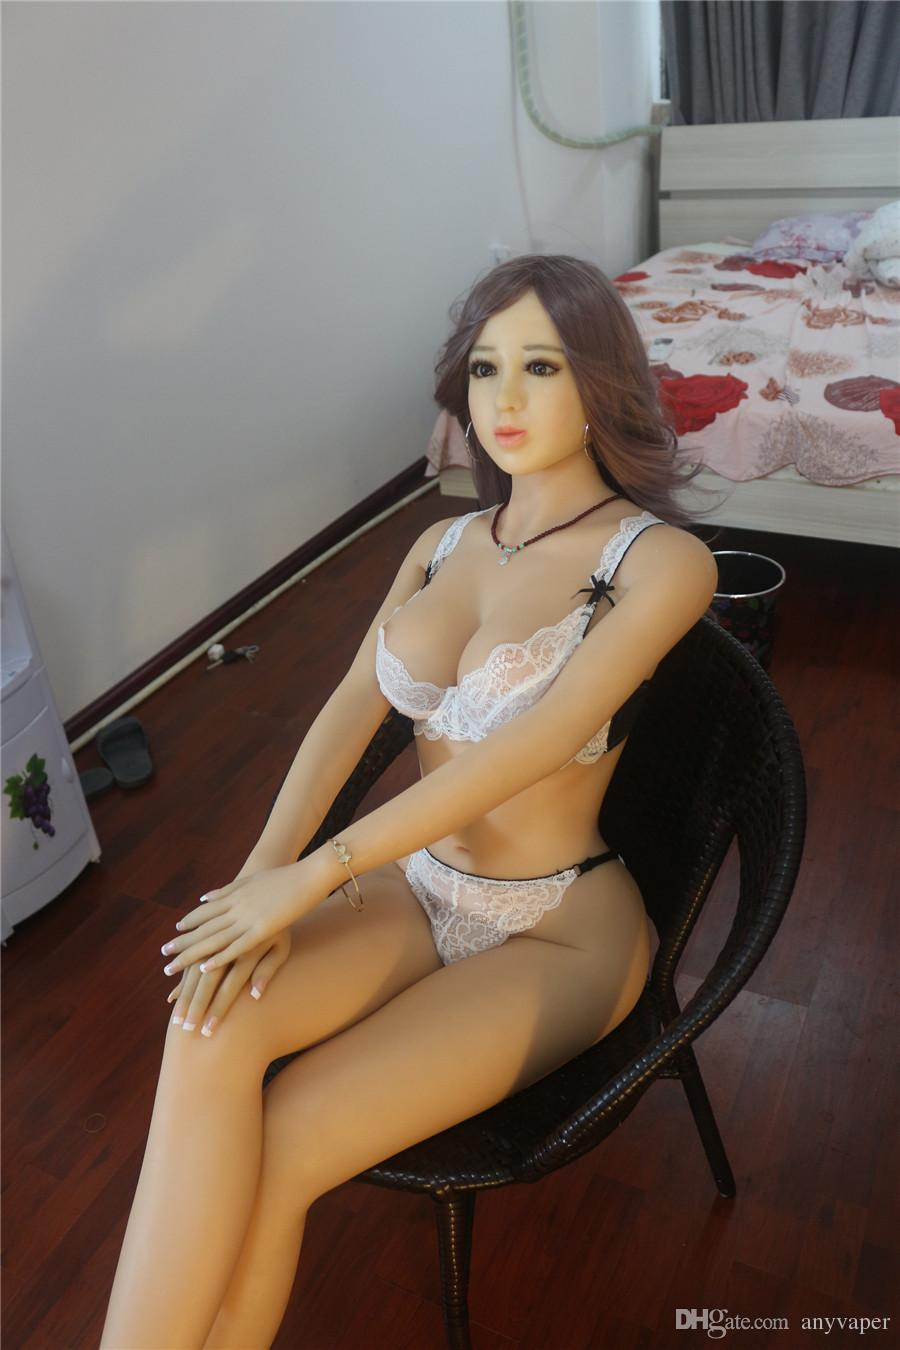 Силиконовые супер секс куклыреалистикв иркутске